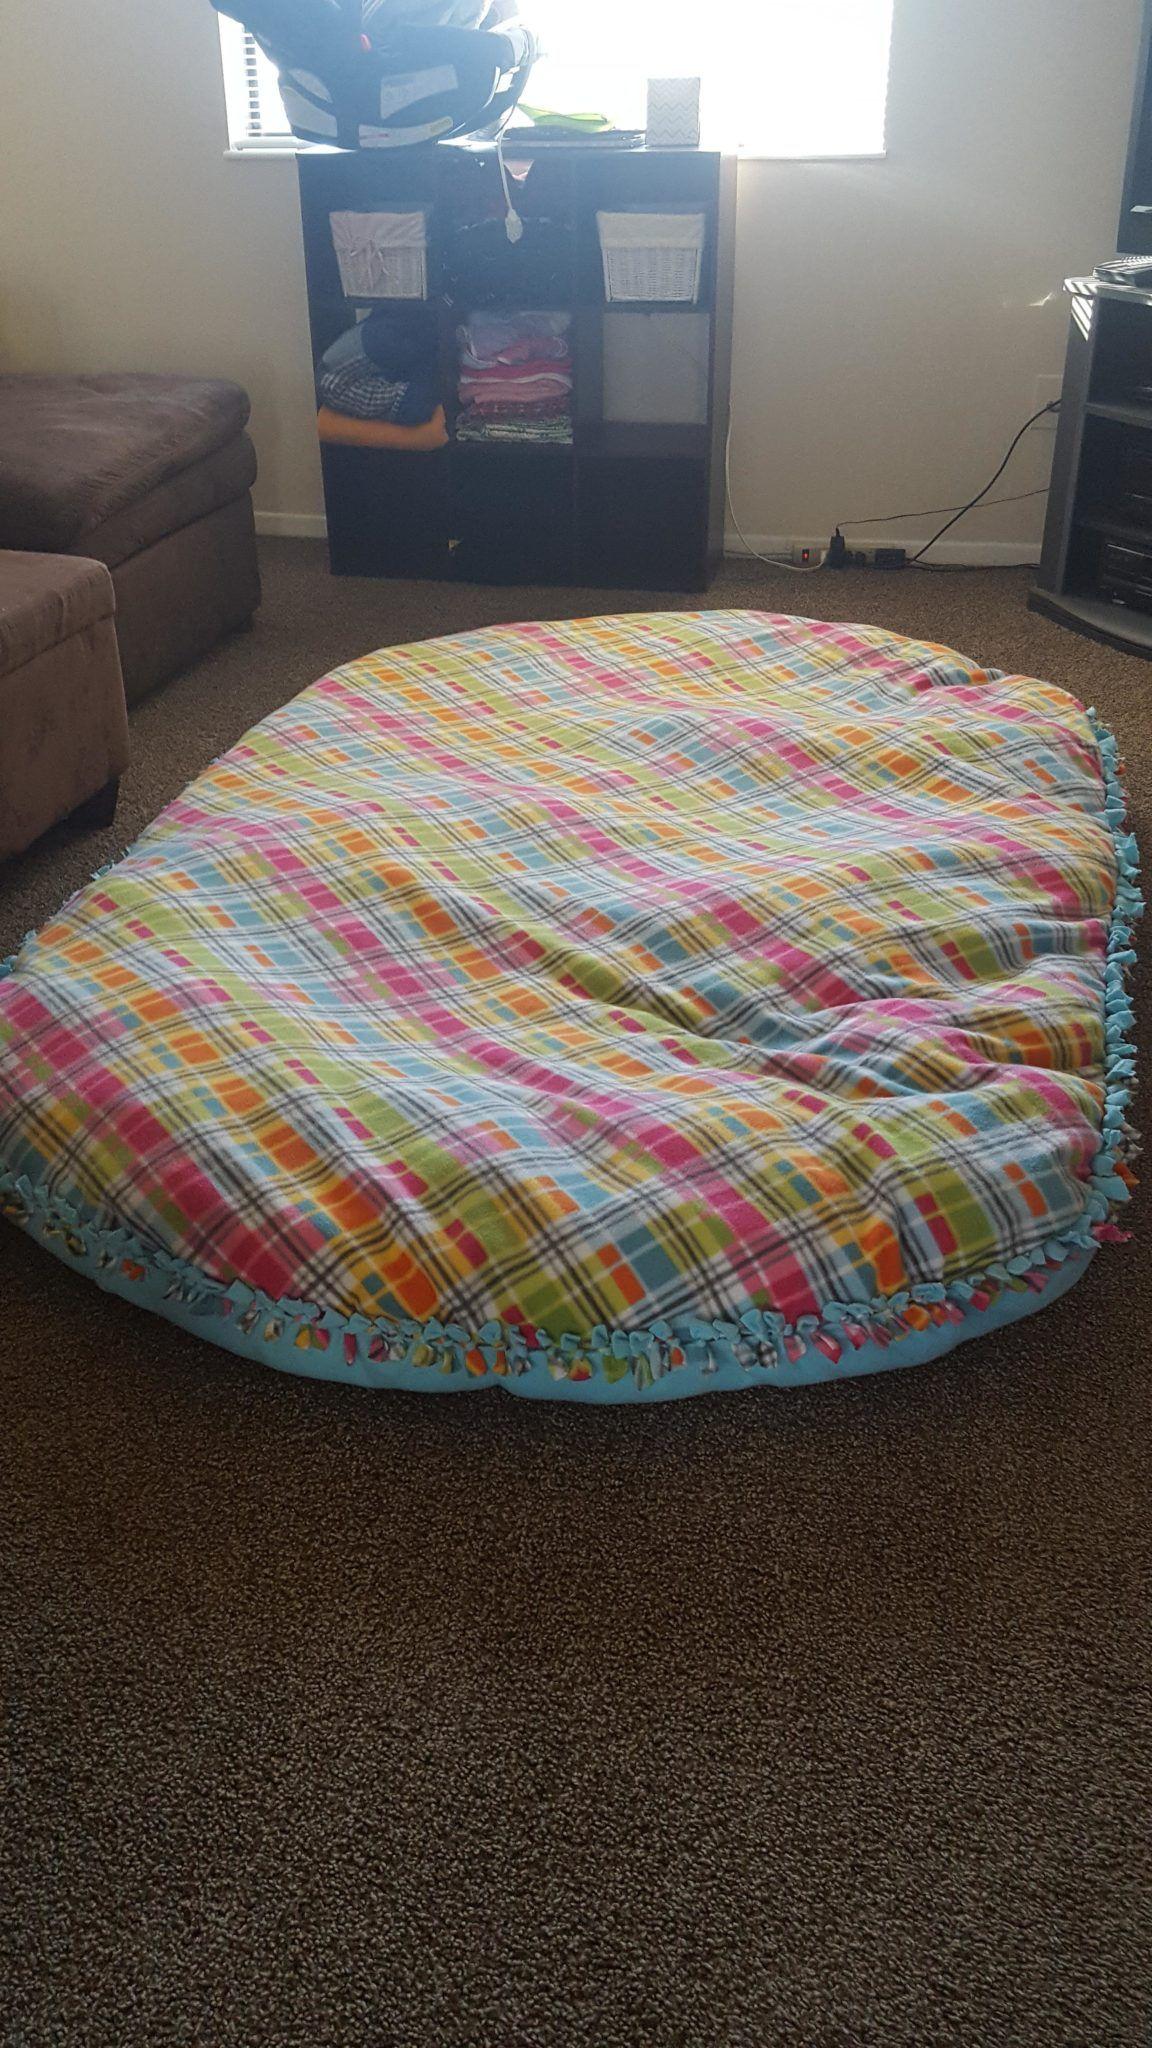 Huge Floor Pillow Floor Pillows Diy Floor Cushions Diy Diy Pillows